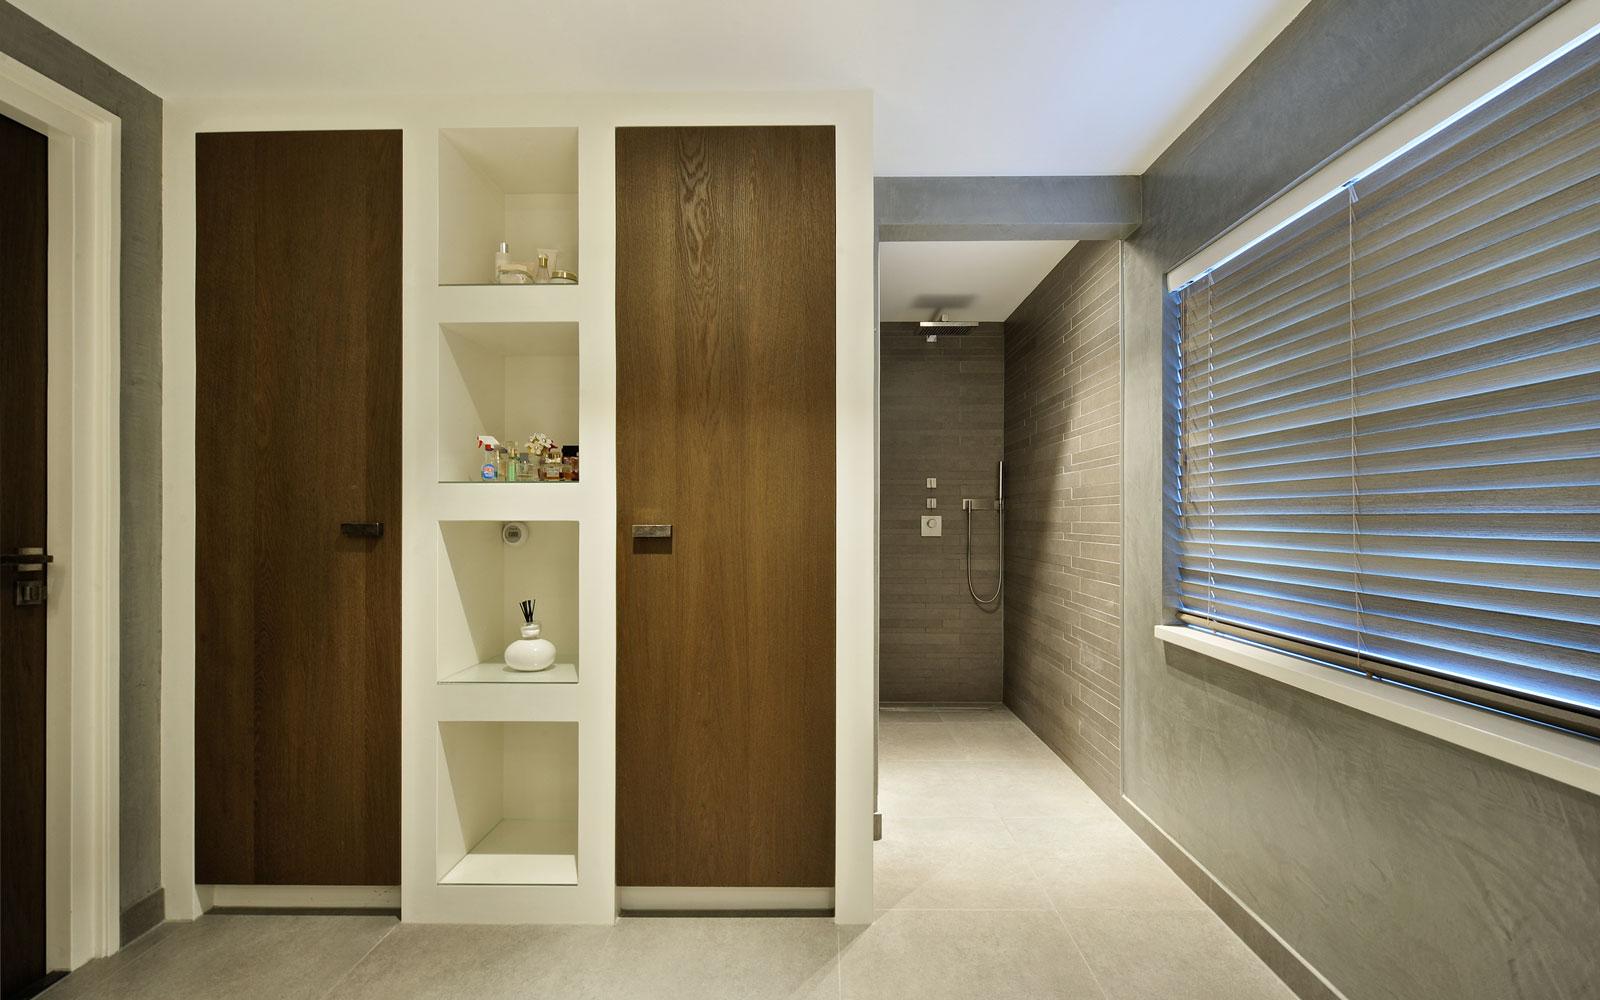 Badkamer, kasten, hout, wit, groot raam, metamorfose, Boxxis Architecten